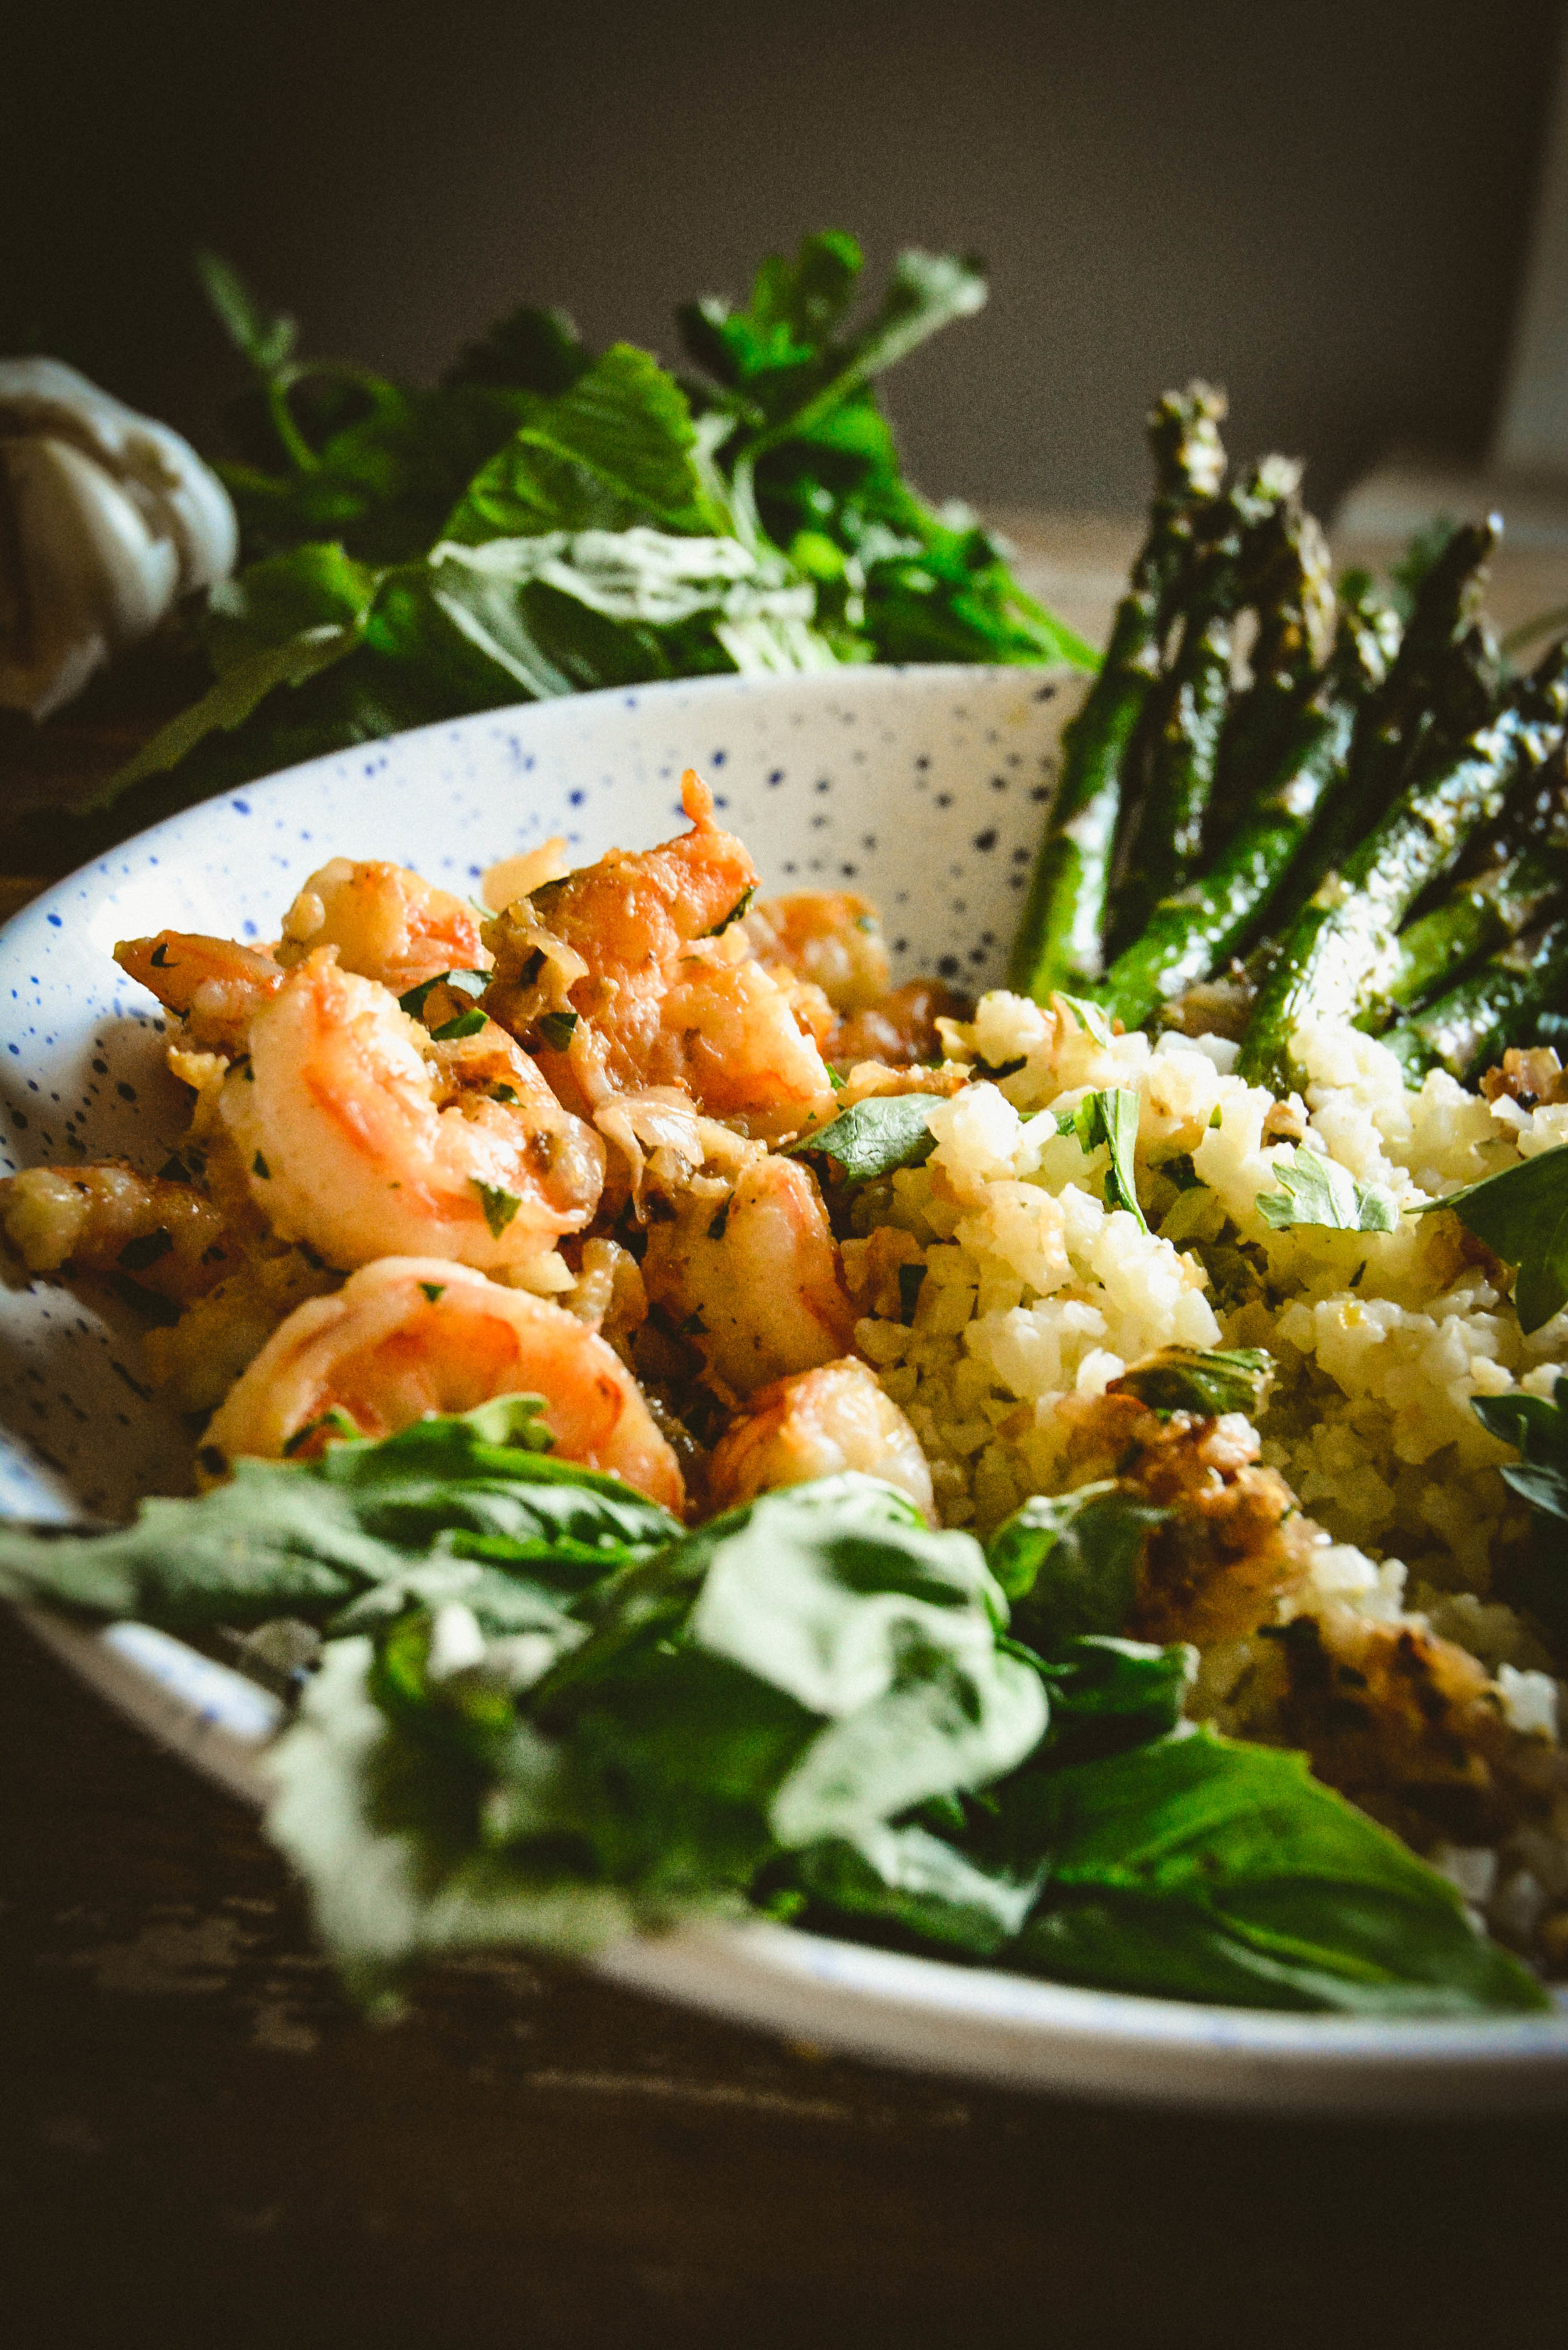 shrimp, cauliflower and asparagus in lemon oil